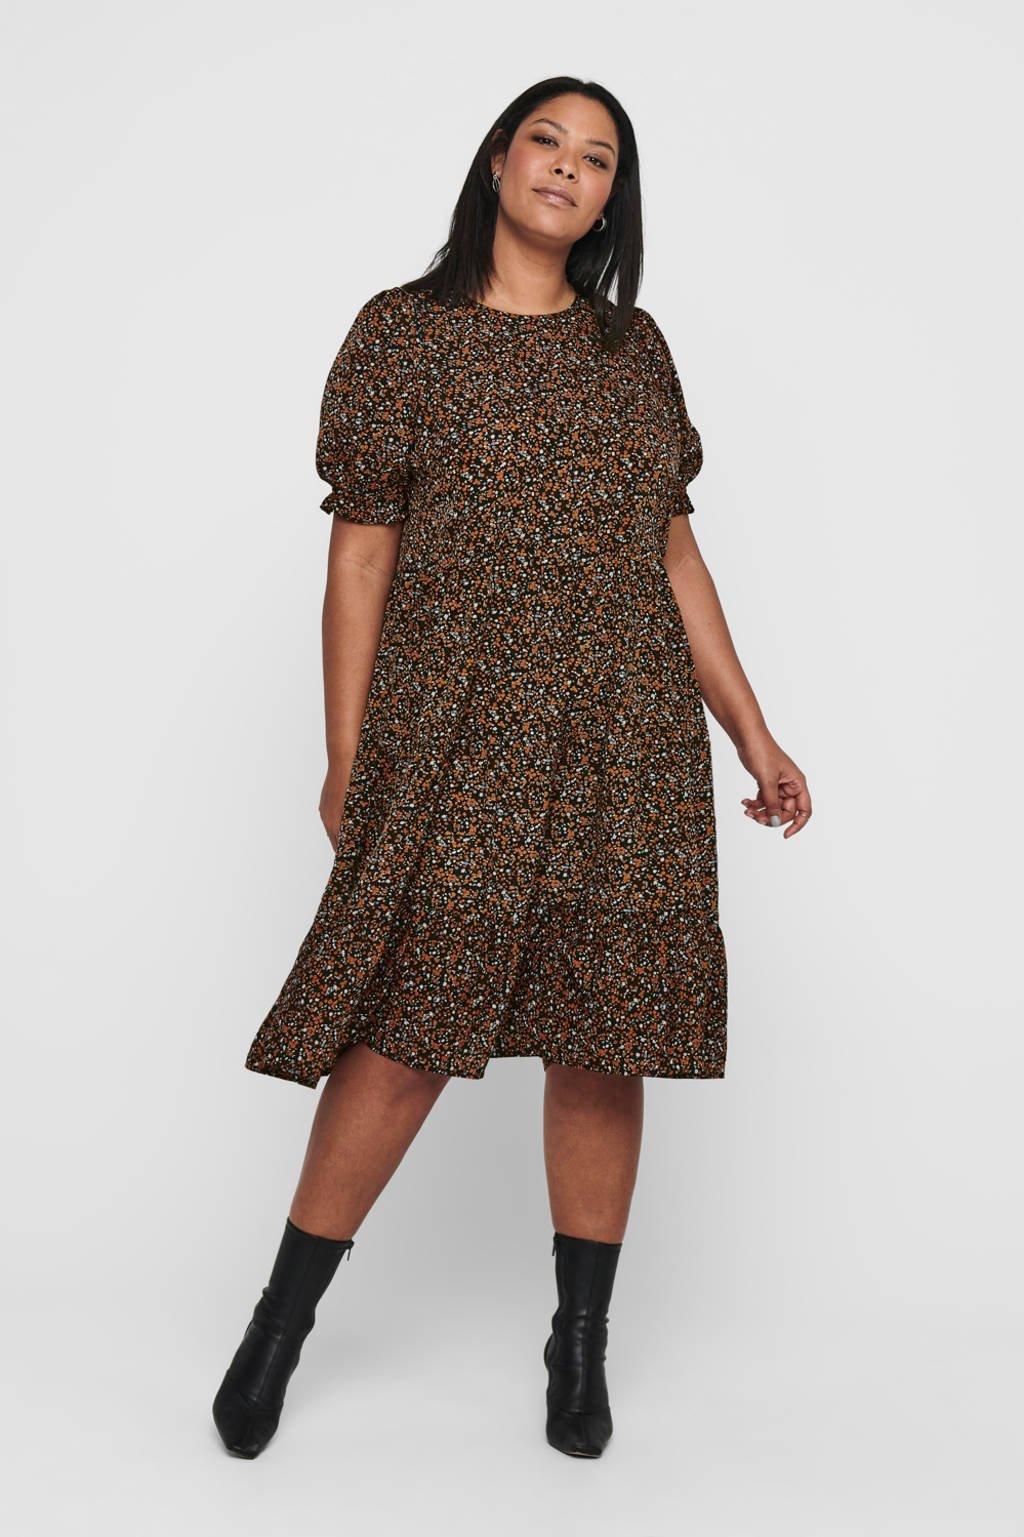 ONLY CARMAKOMA gebloemde jurk CARNORI zwart/oranje/wit, Zwart/oranje/wit